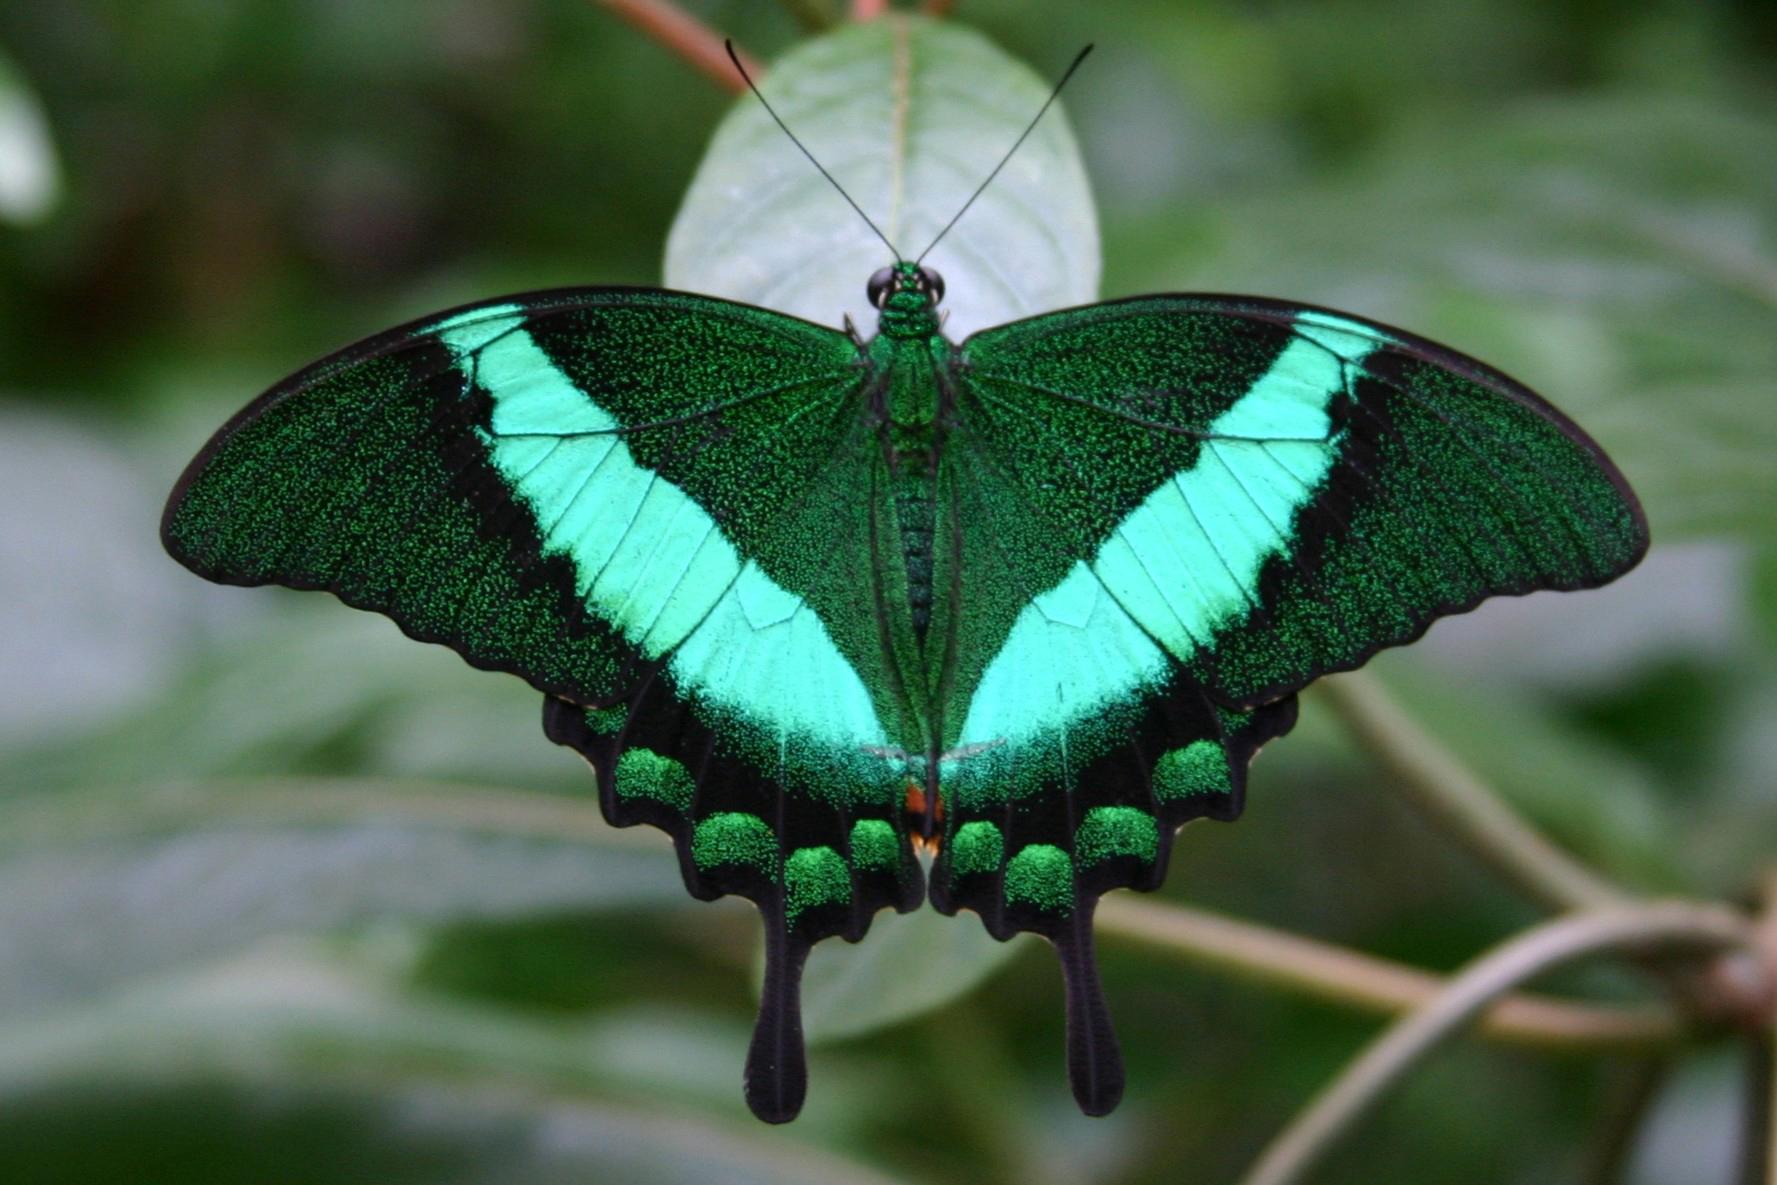 Emerald Swallowtail. Photo courtesy of Frederik Meijer Gardens.